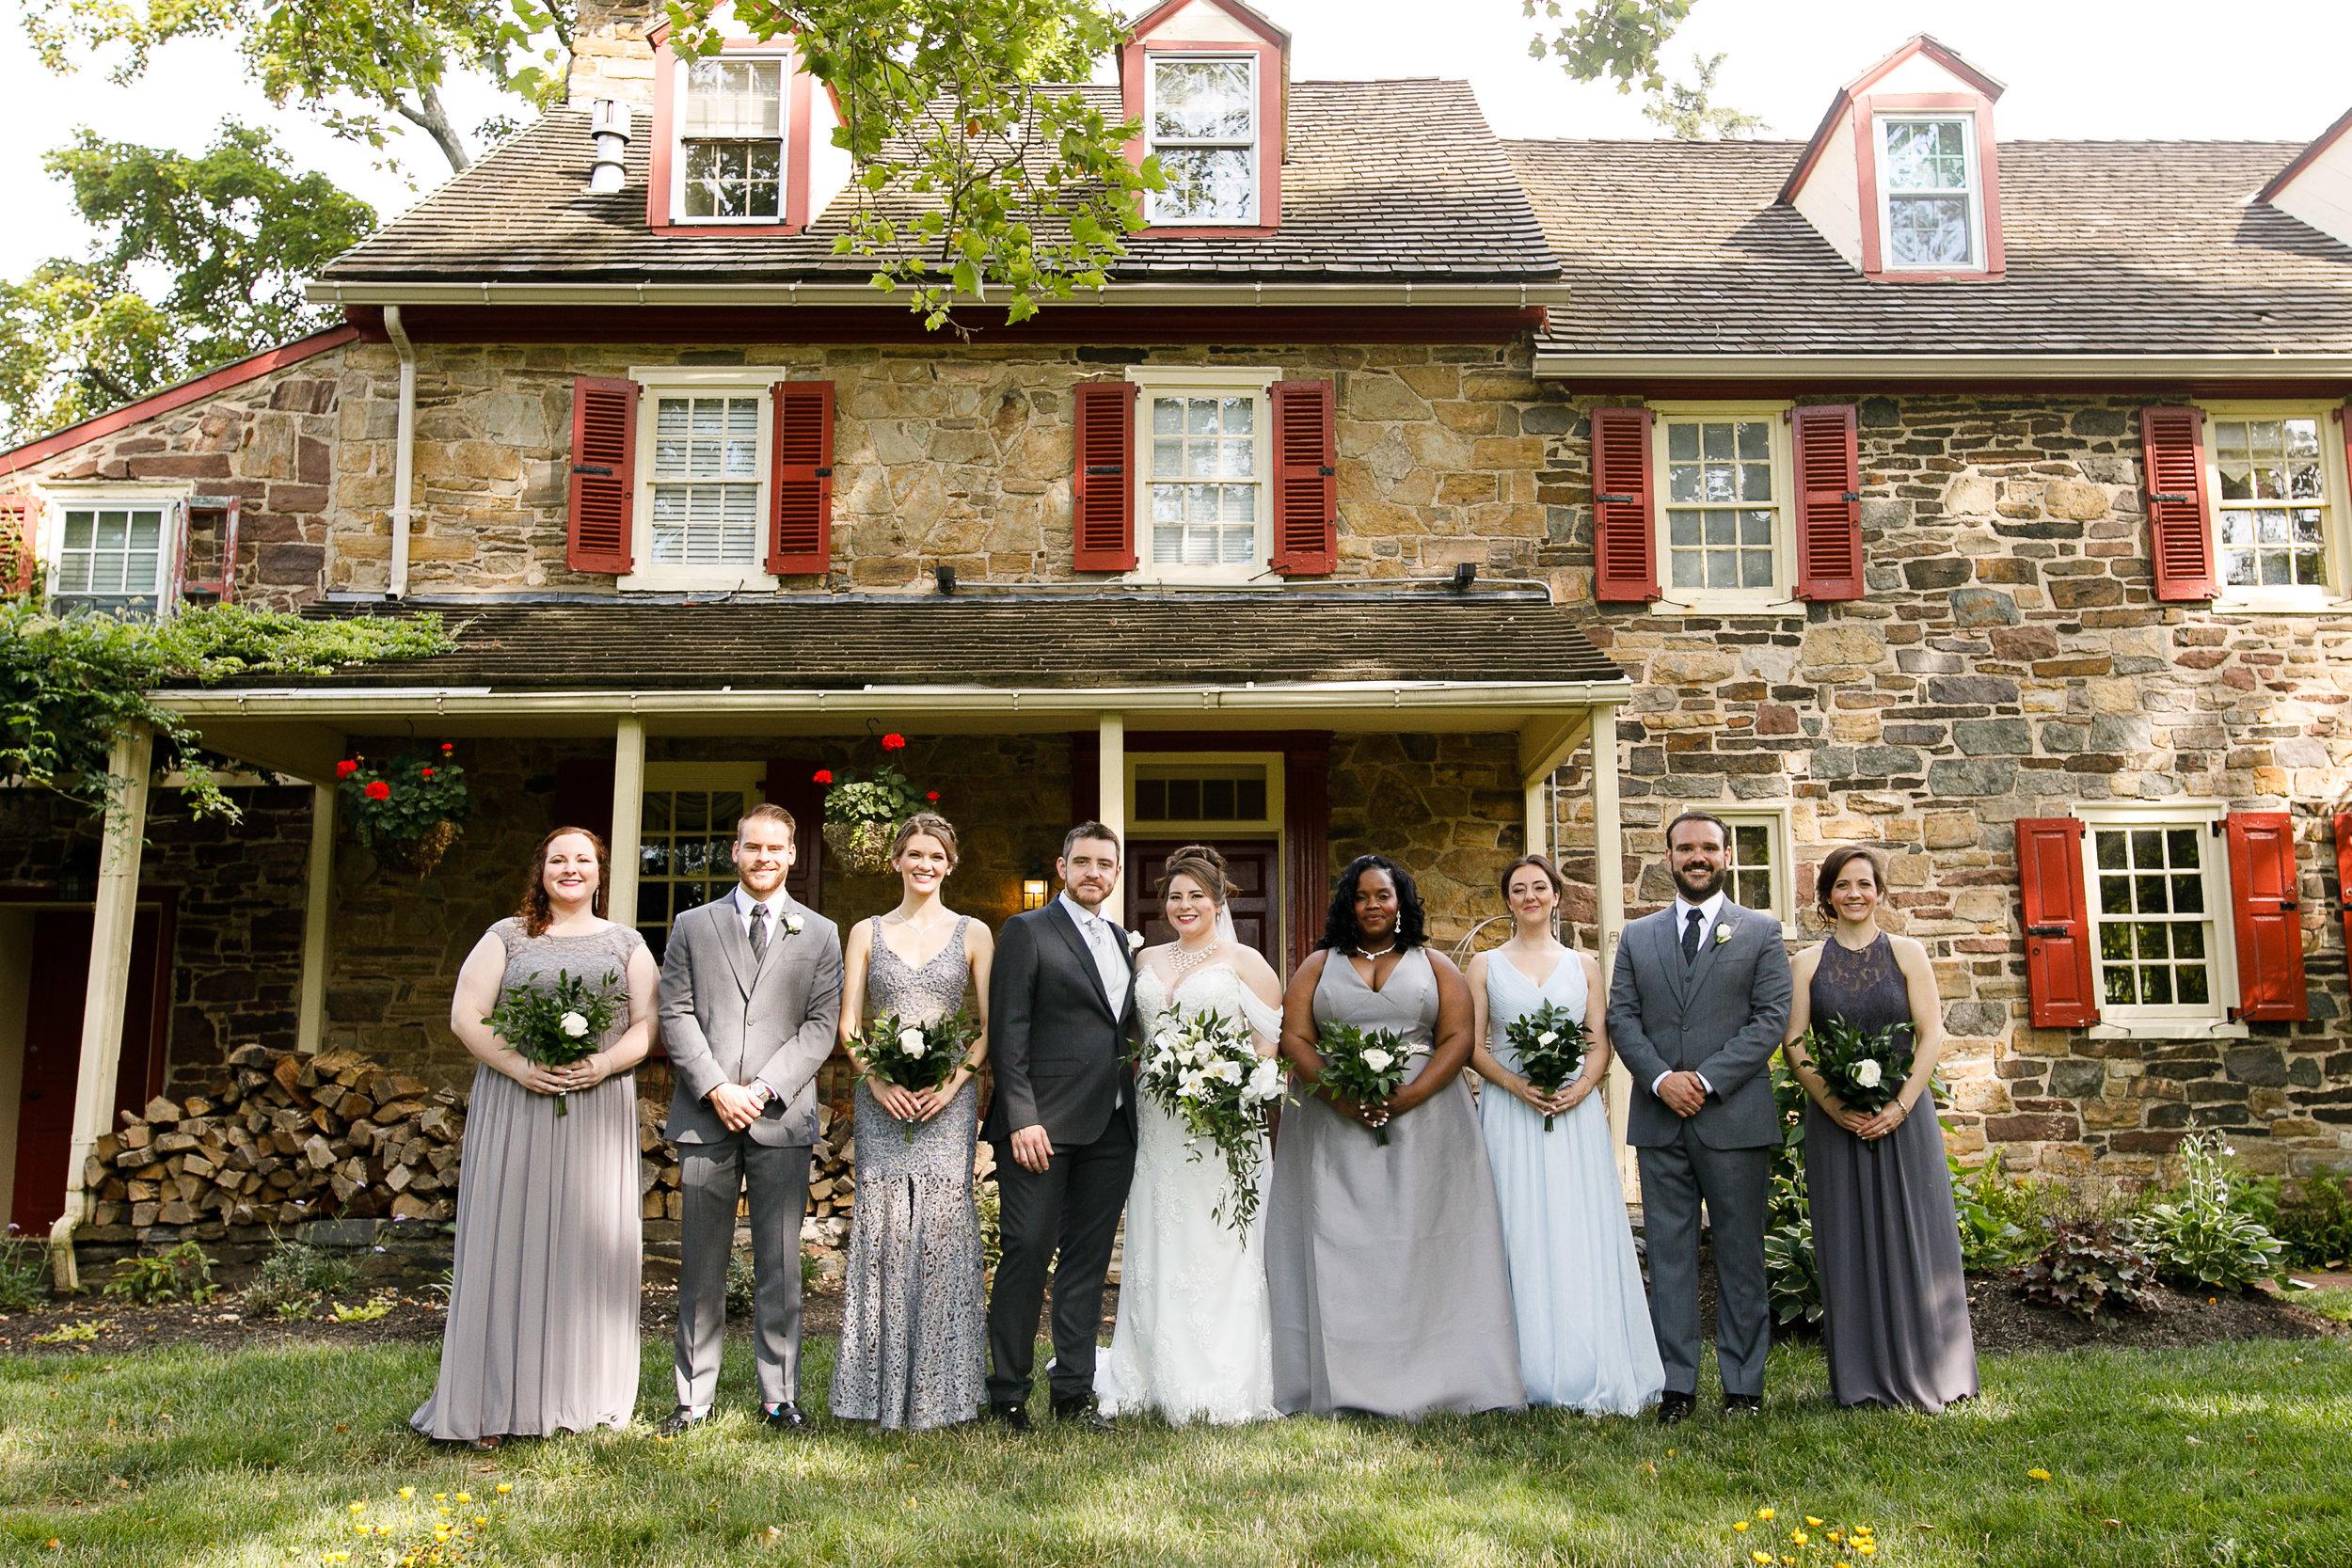 Wedding at Joseph Ambler In Bucks County PA16.jpg